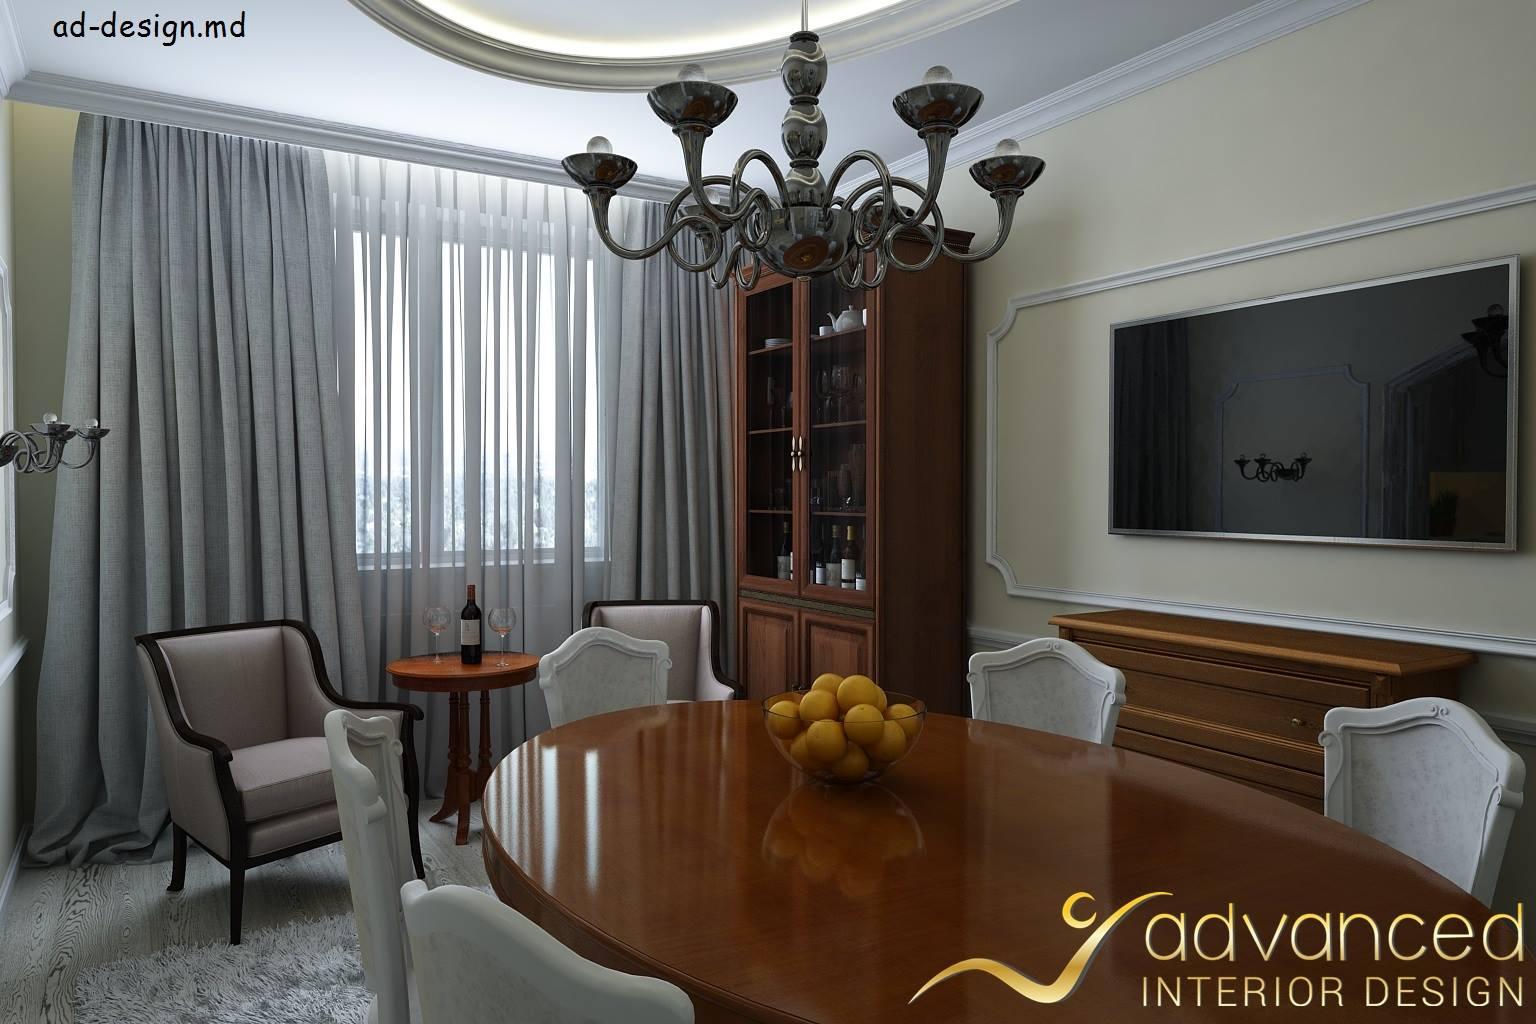 ADVANCED interior design landing page